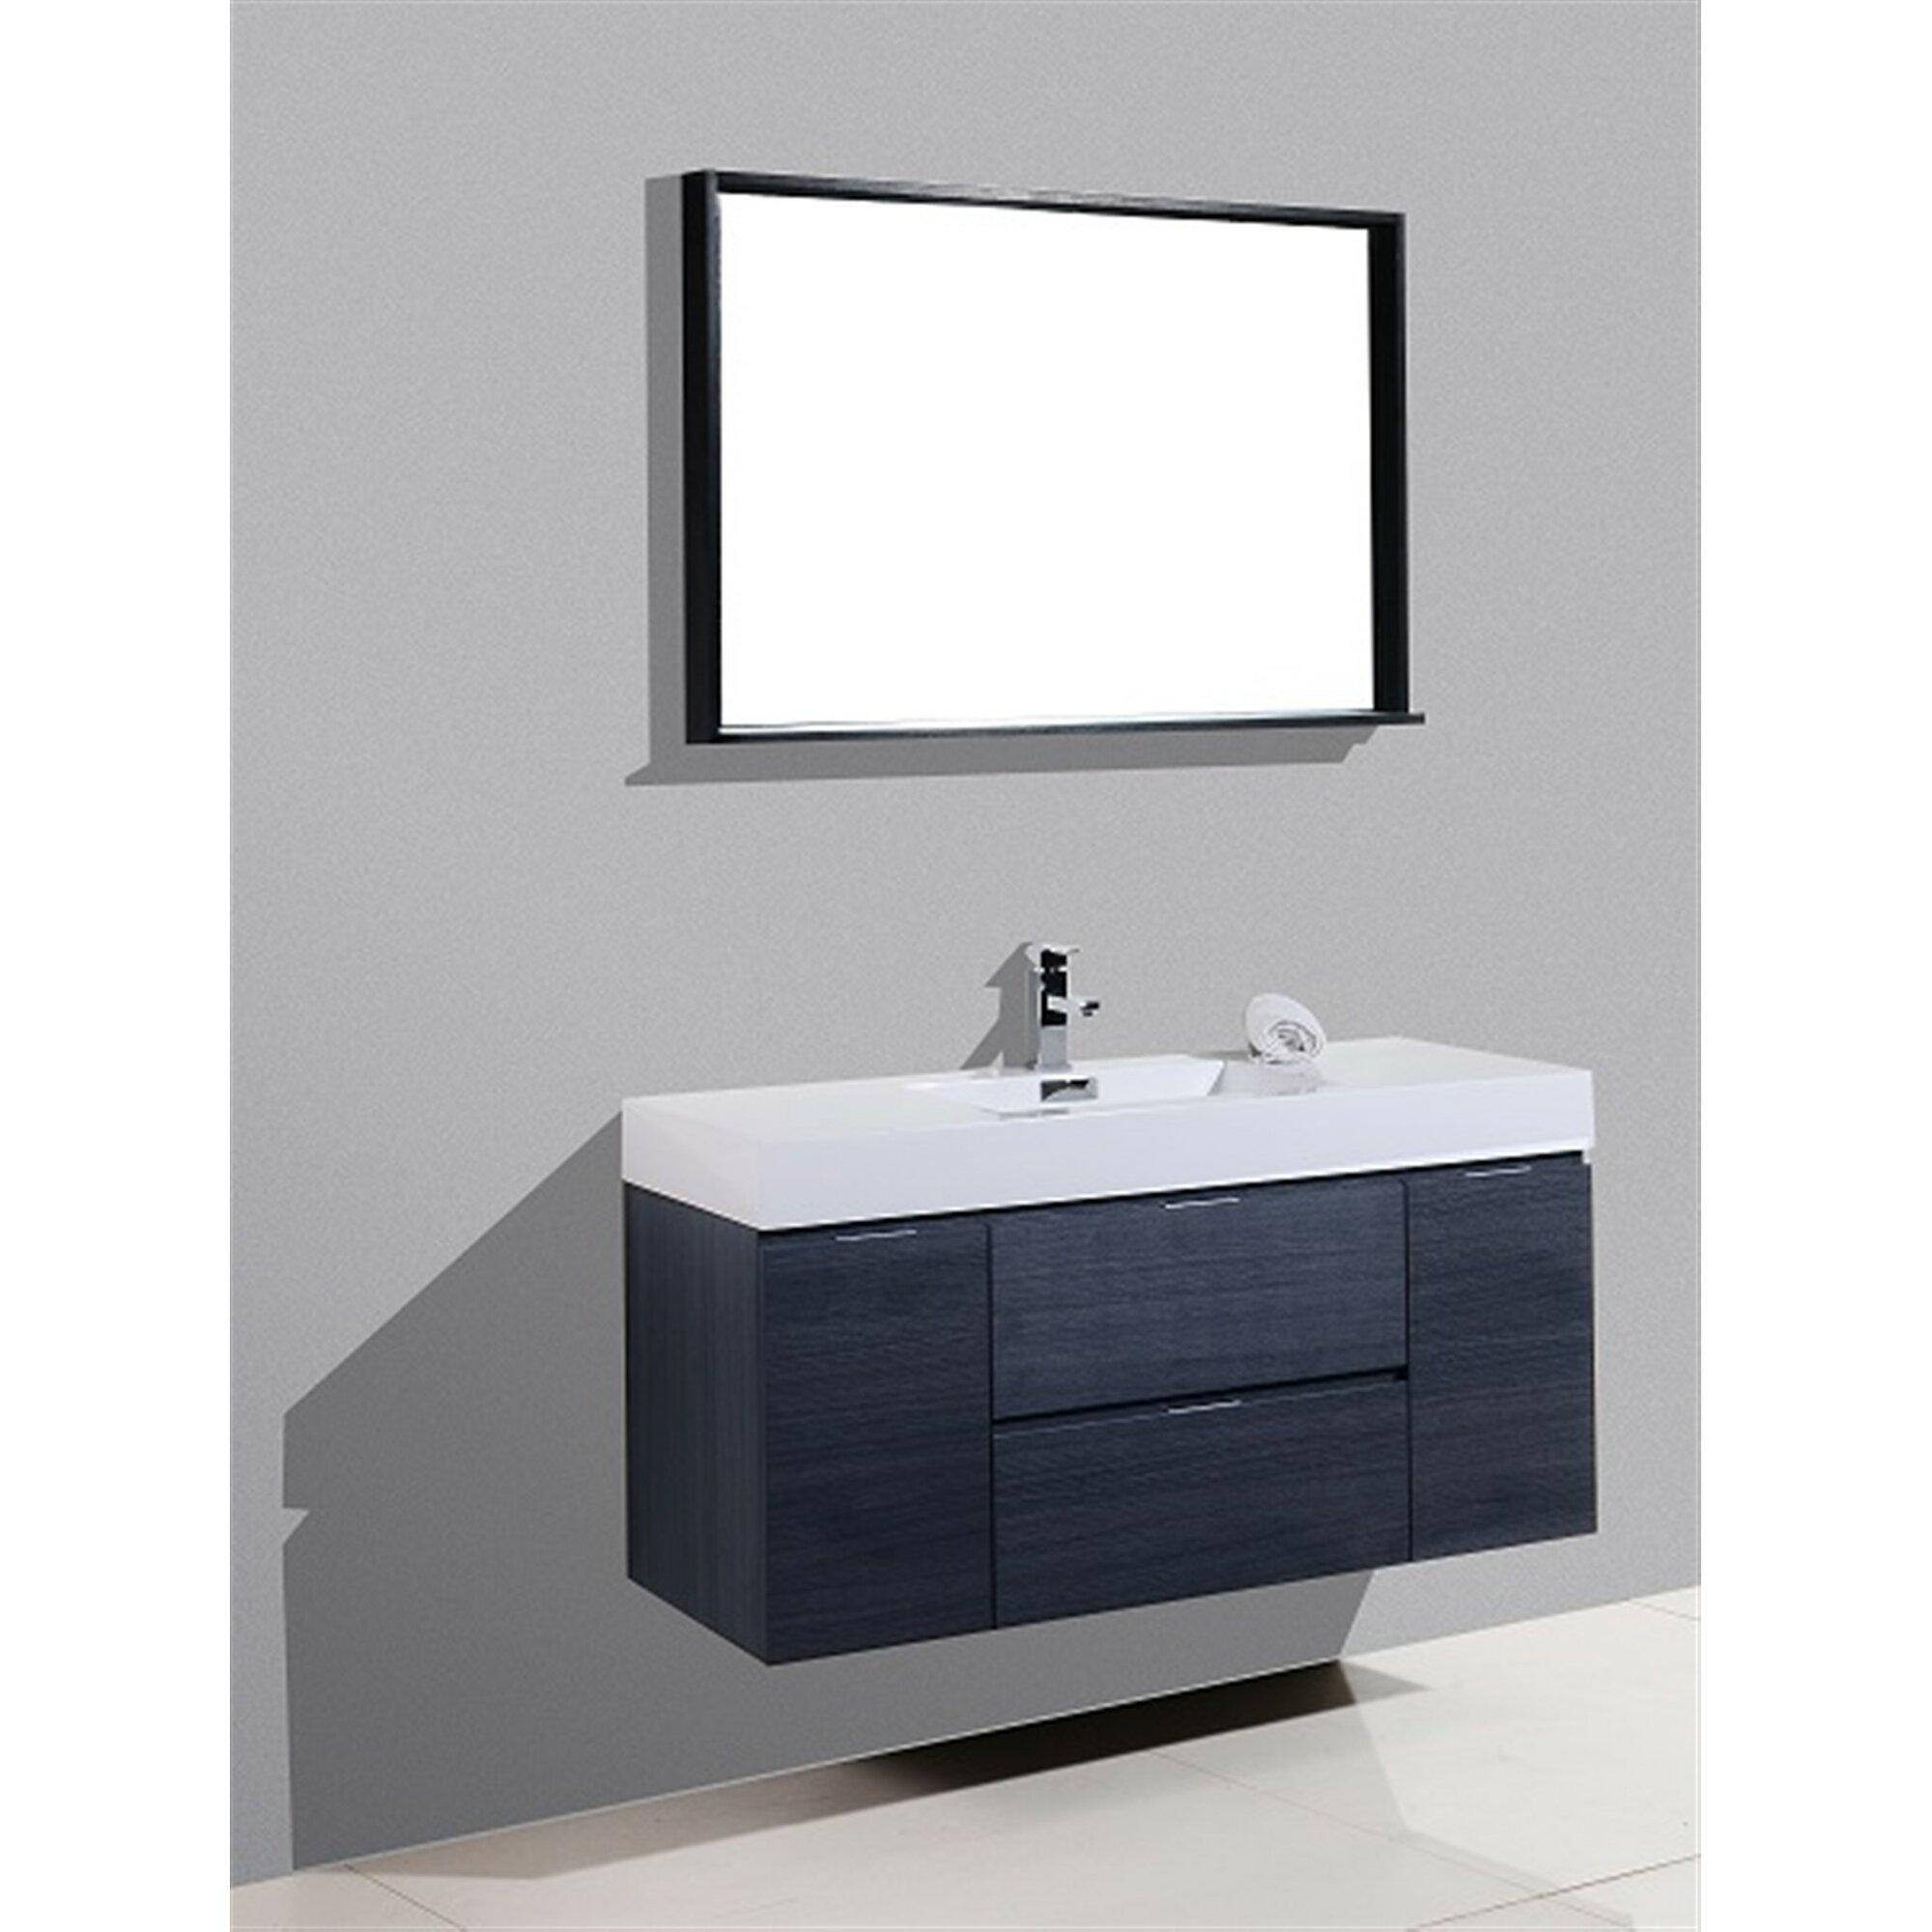 31 Inch Wall Mounted Black Gl Bathroom Vanity